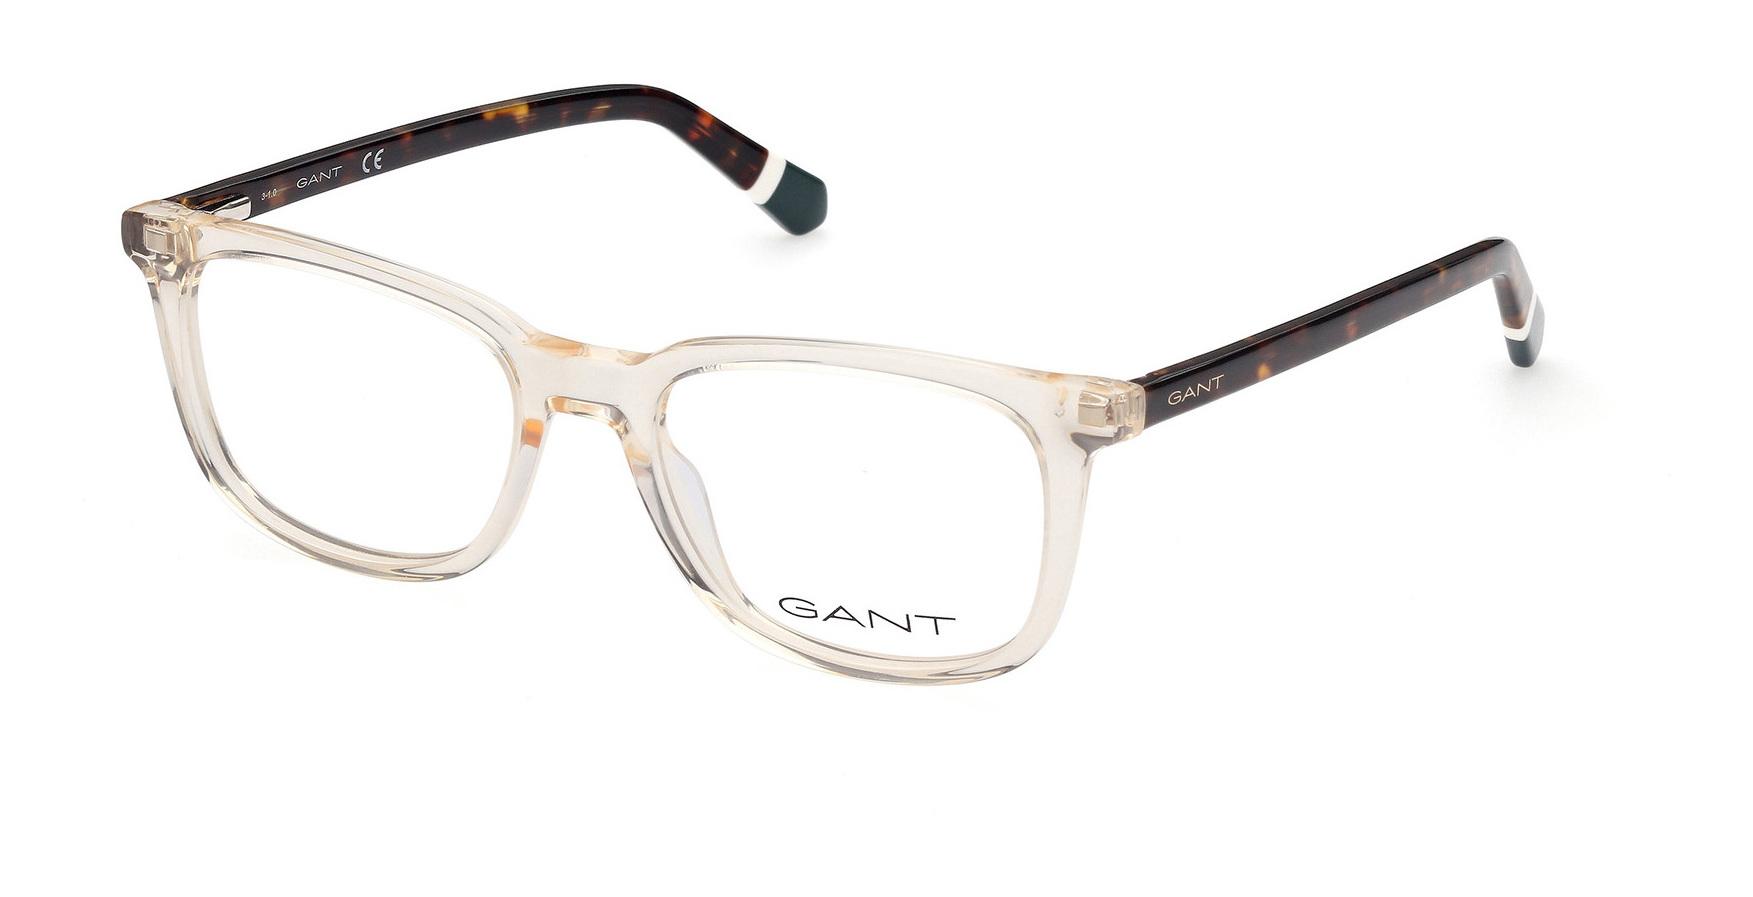 Gant Ga3232